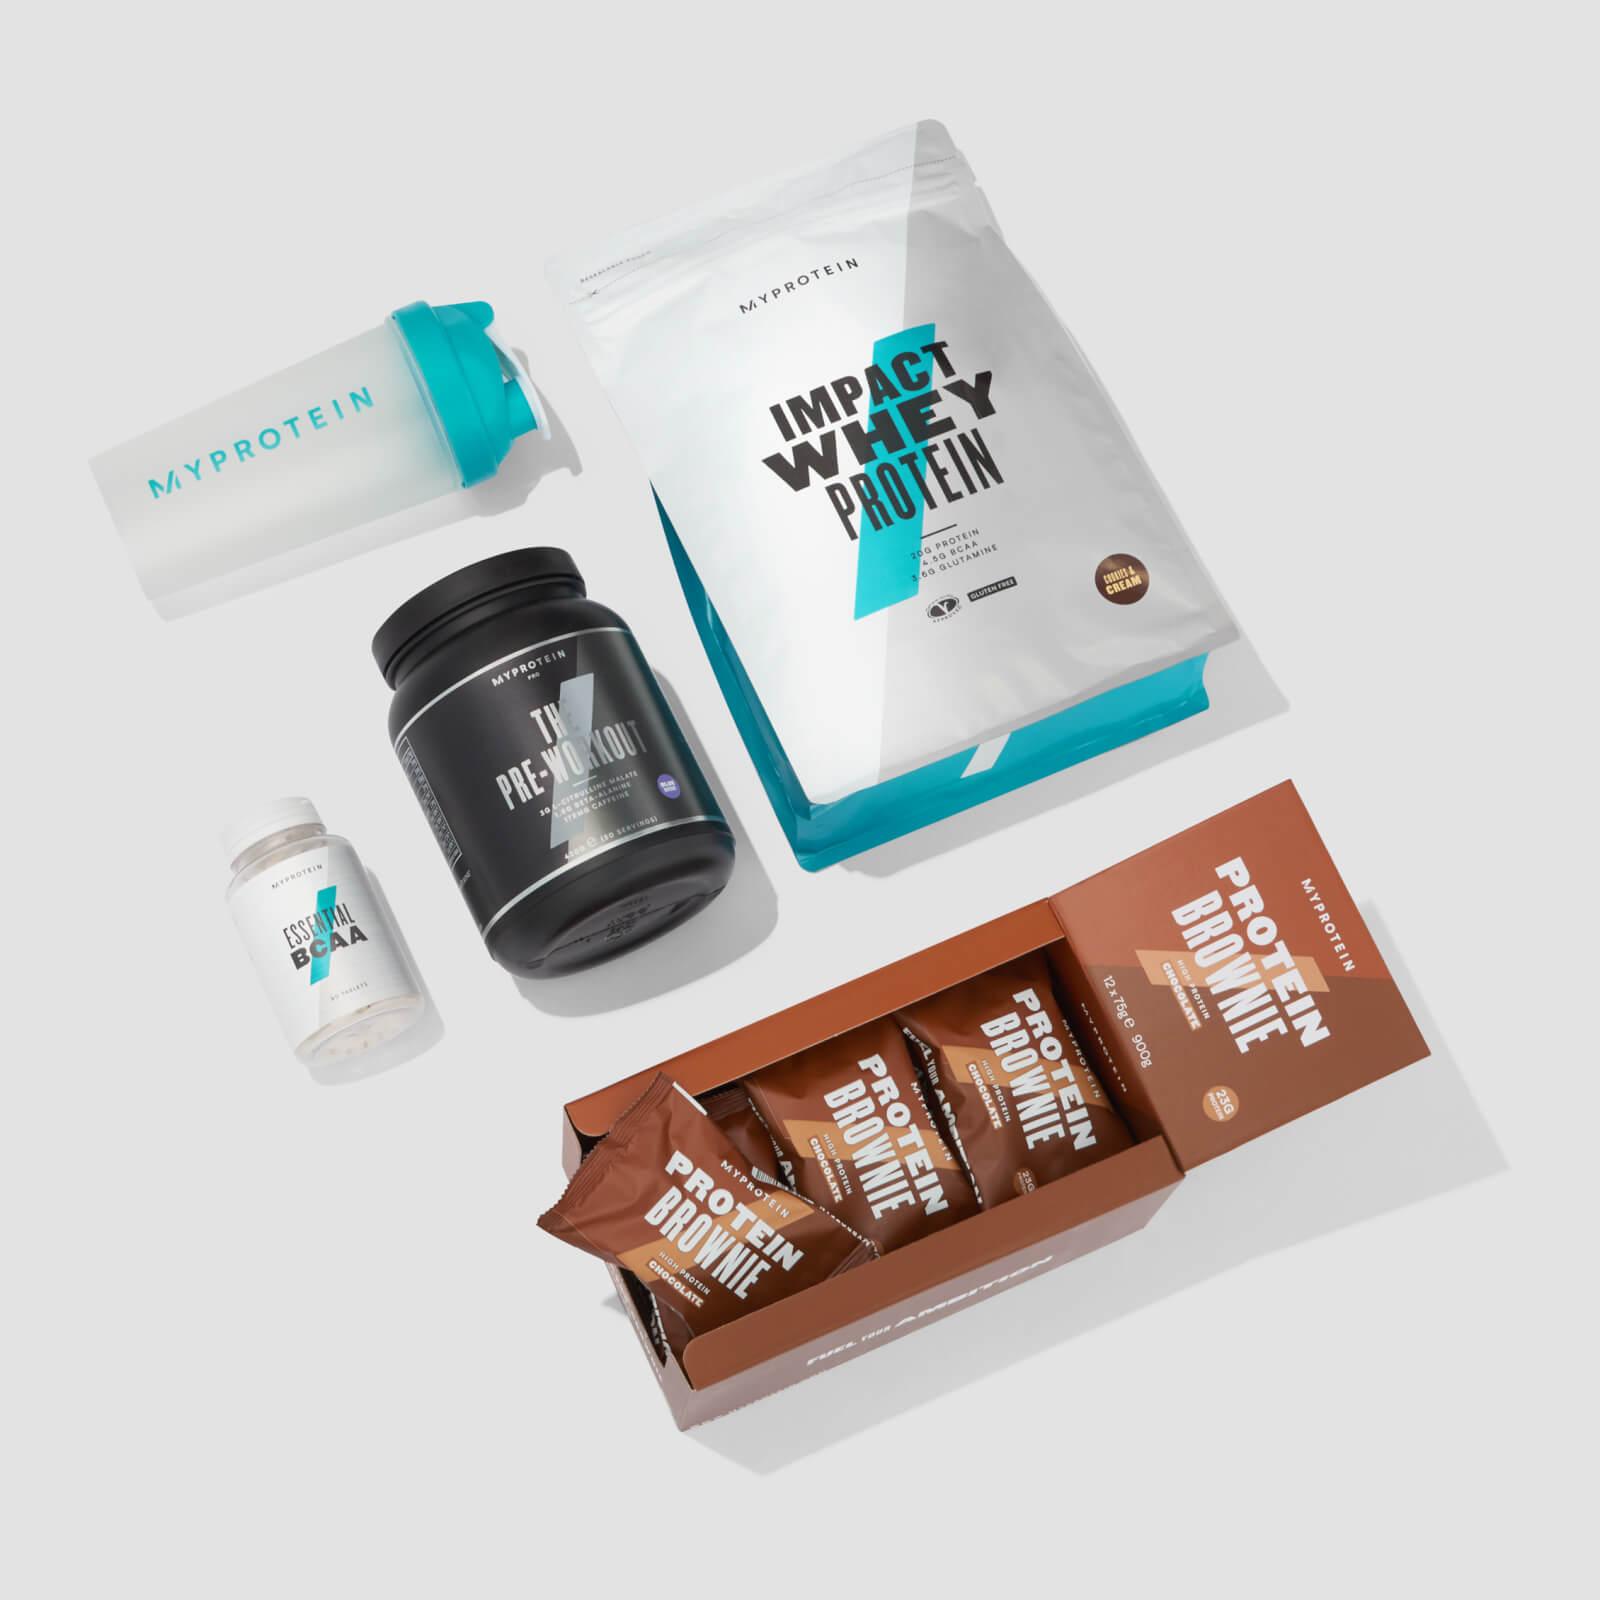 Купить Набор для студента - White Chocolate - Chocolate Brownie, Myprotein International